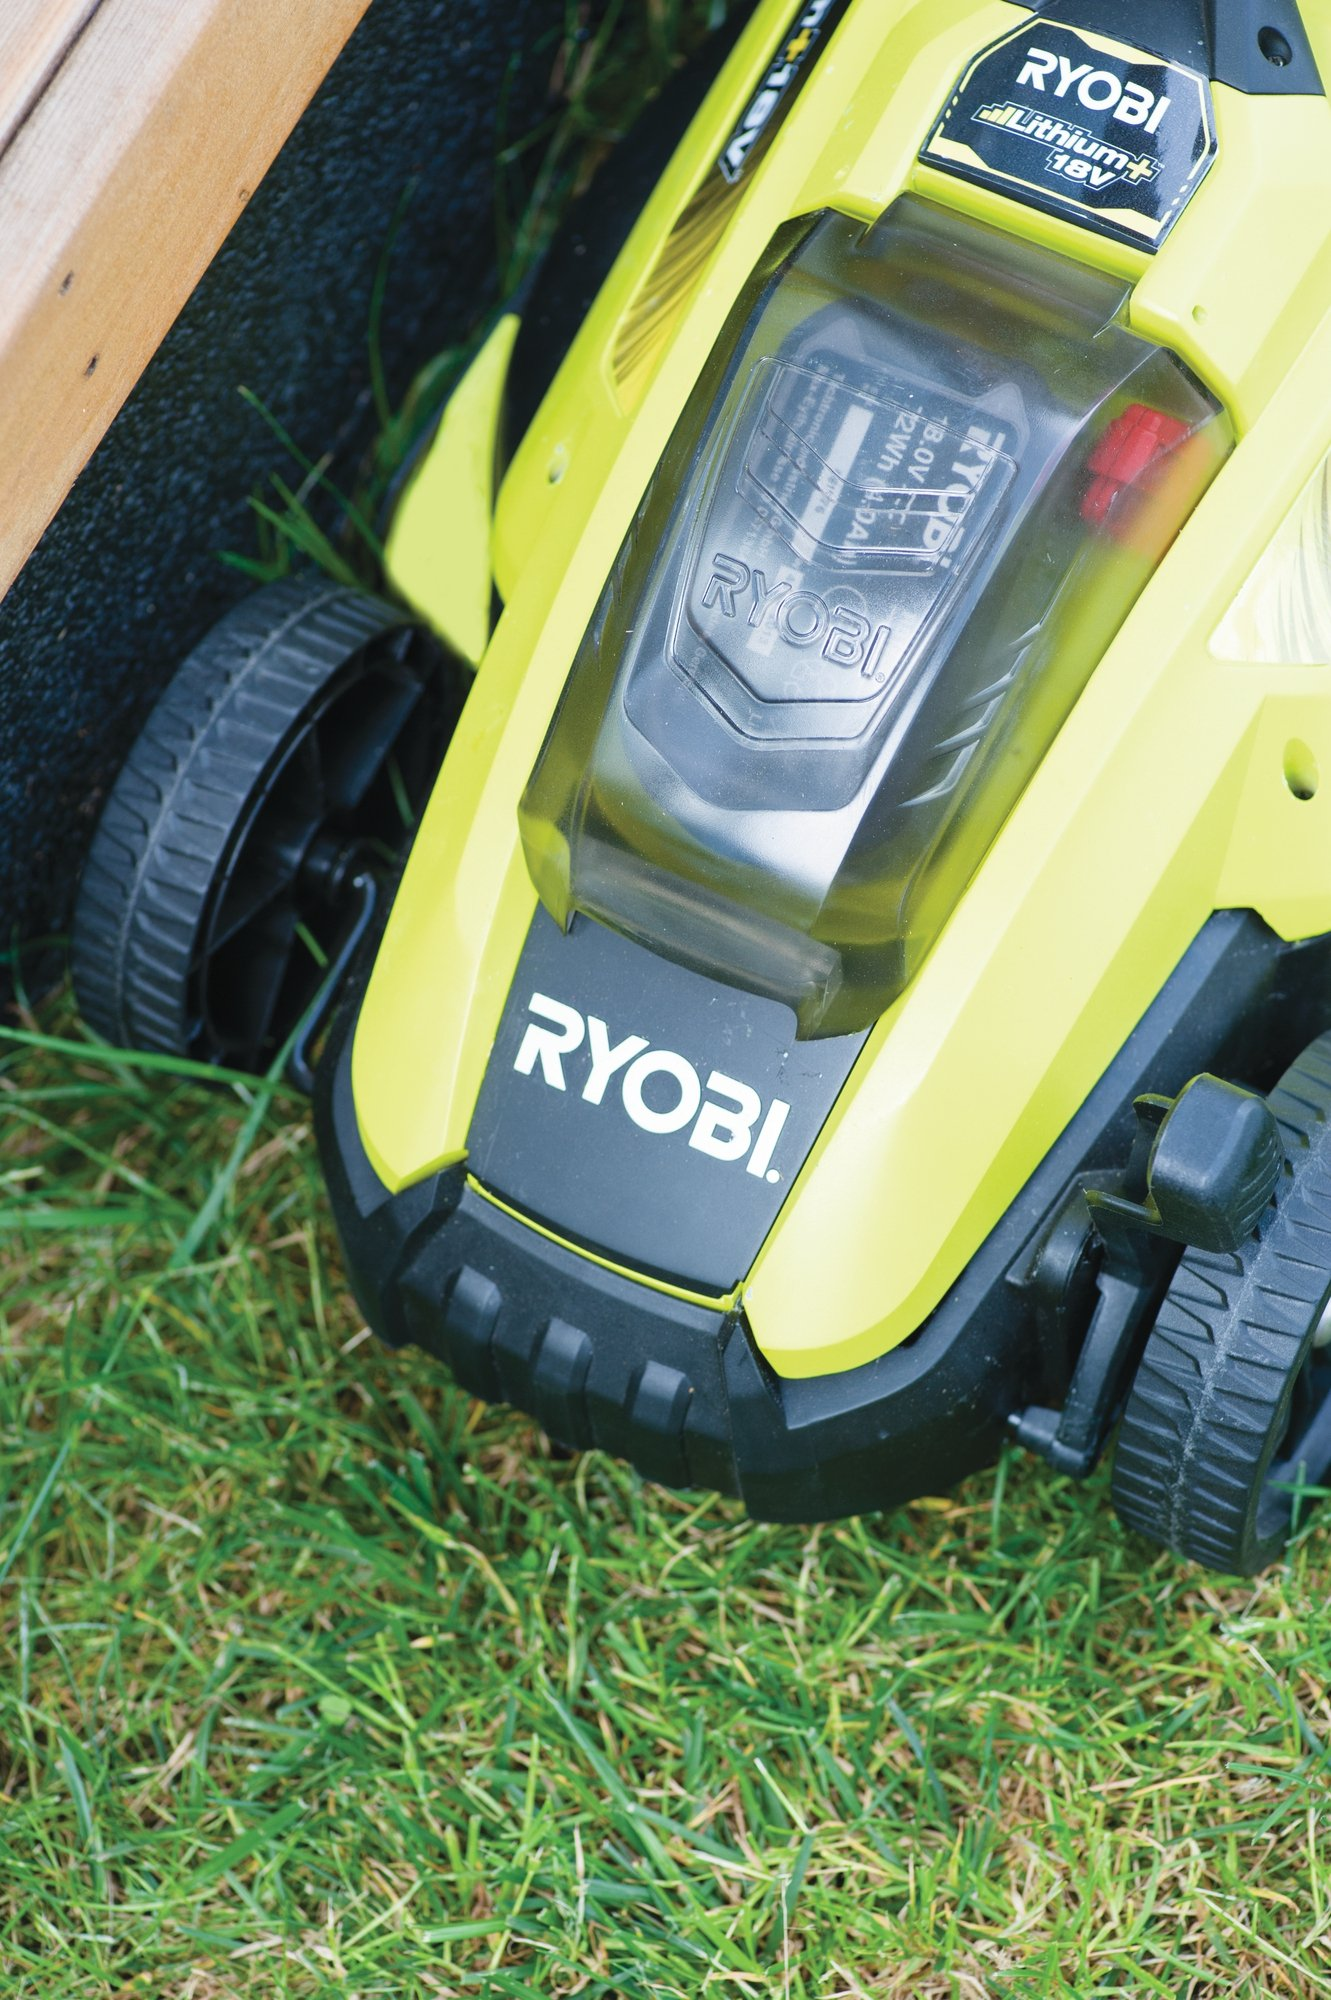 Ryobi-ONE-OLM1833H-18-V-Lawnmower-by-Ryobi